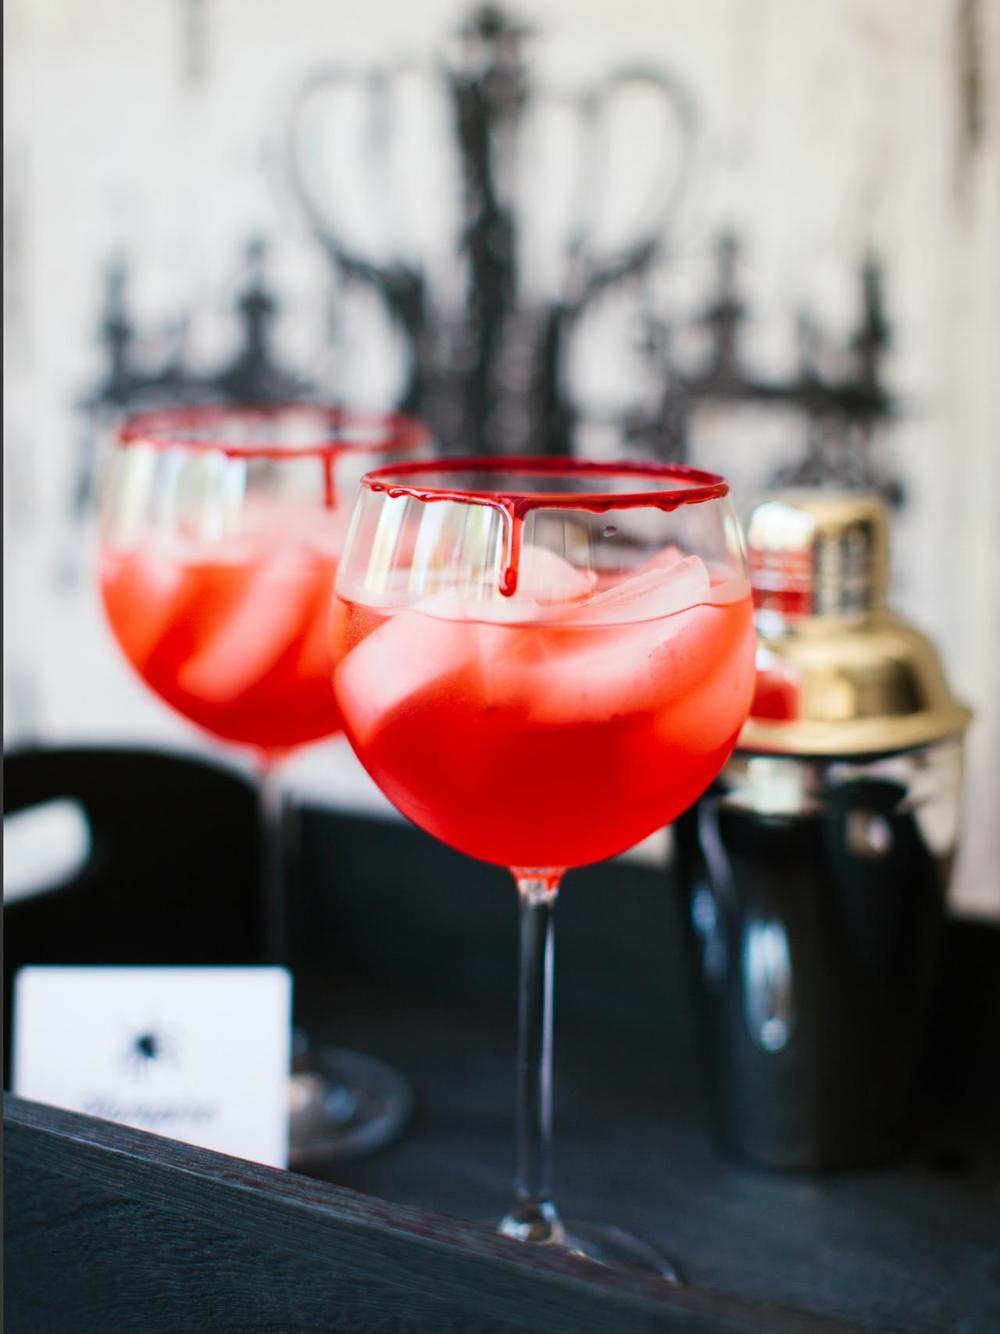 CI-Rennai-Hoefer_Halloween-cocktail-vampire-kiss_v.jpg.rend.hgtvcom.1280.1707.jpg